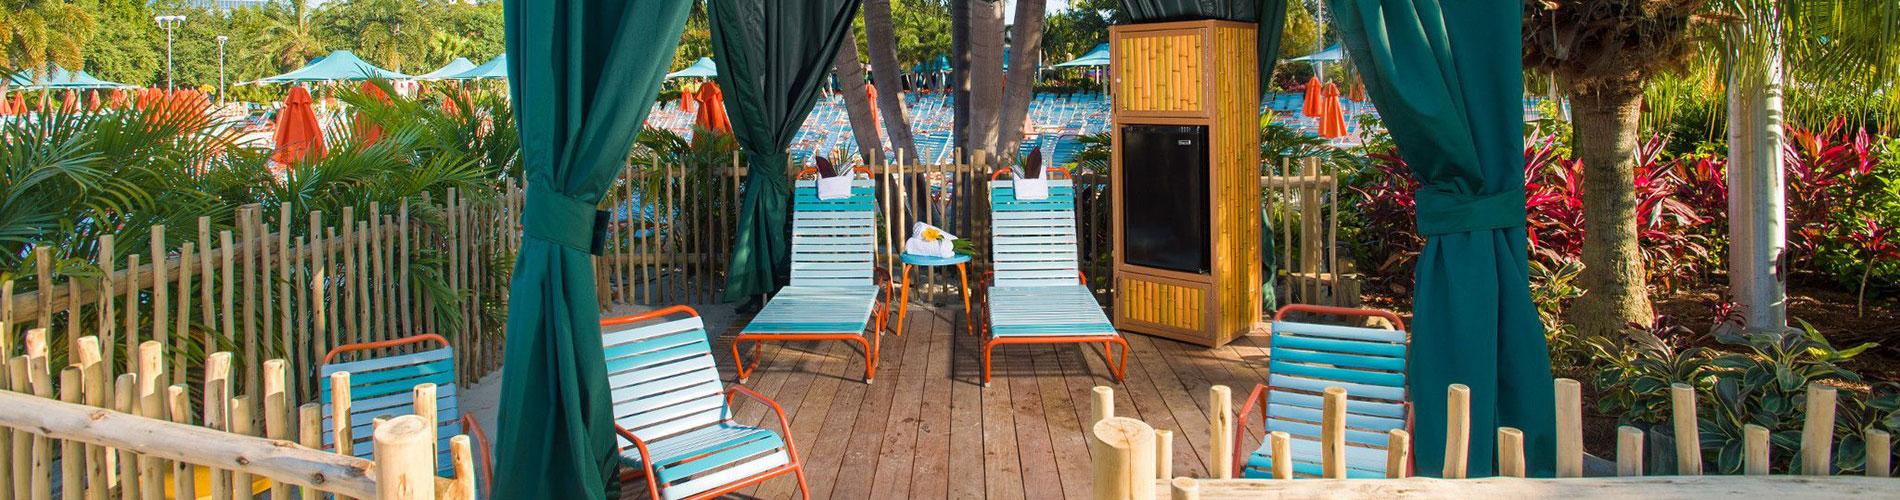 Private Cabanas available at Aquatica Orlando Water Park